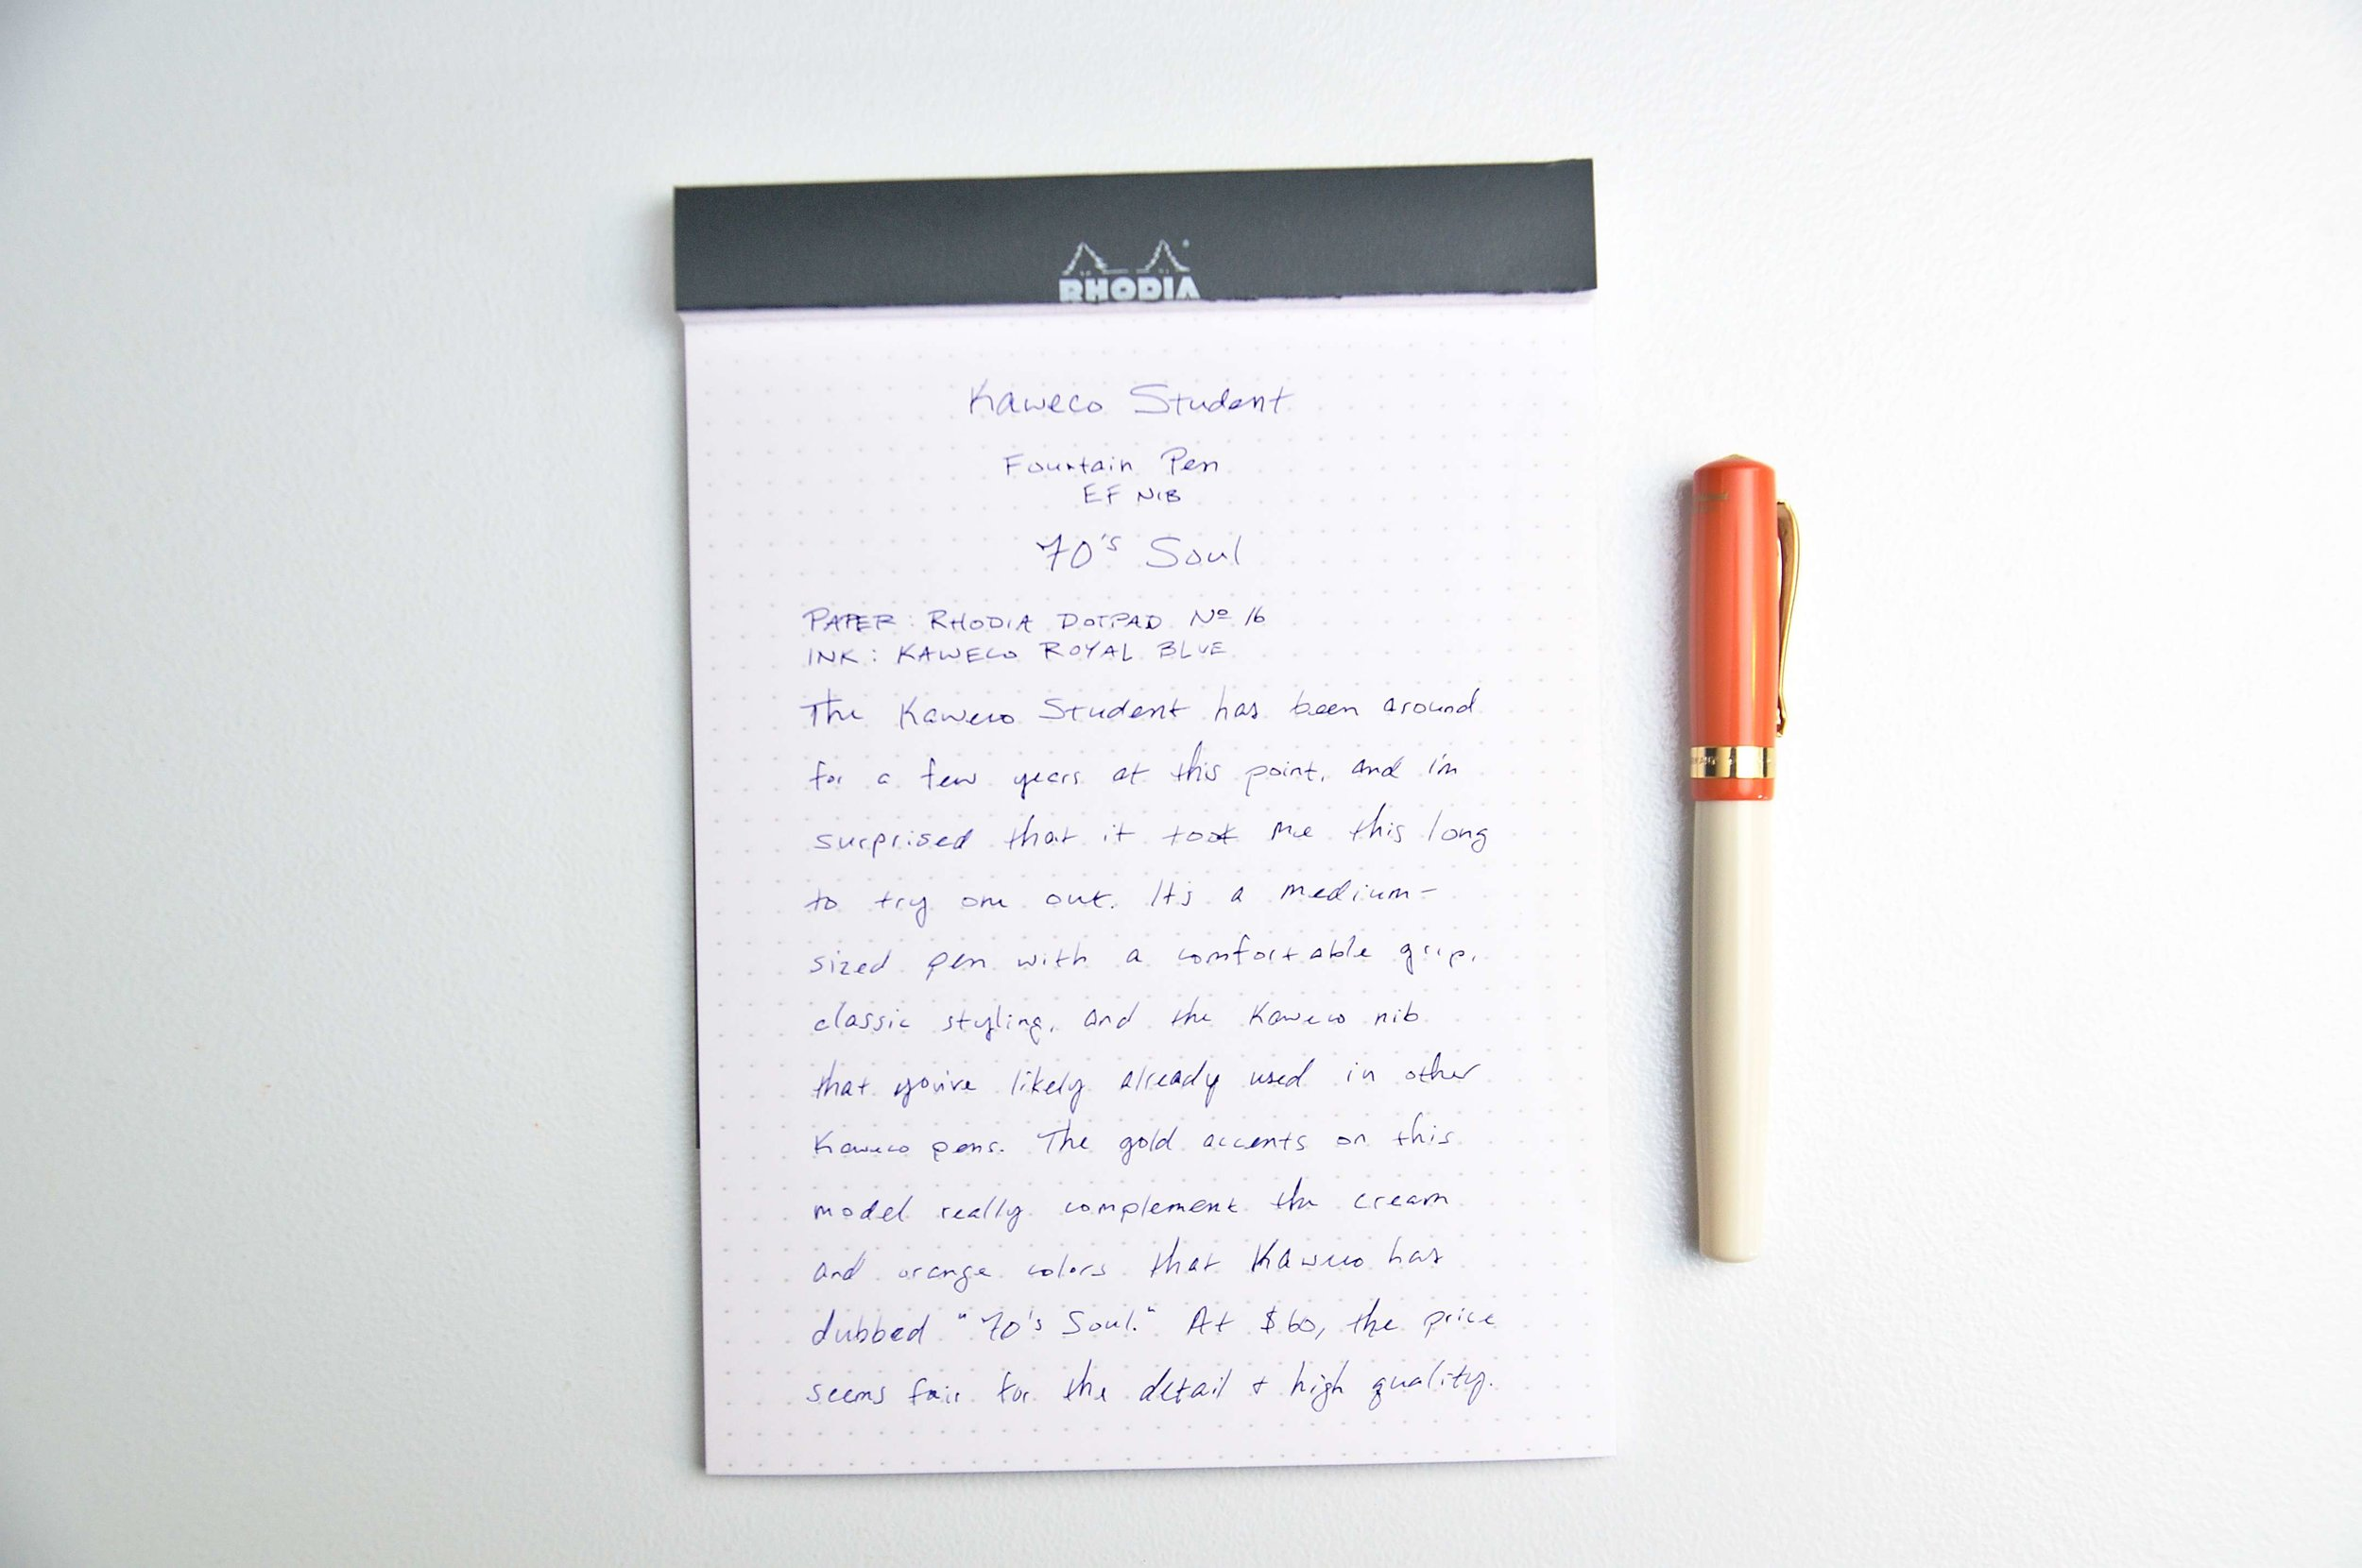 Kaweco Student Fountain Pen Writing